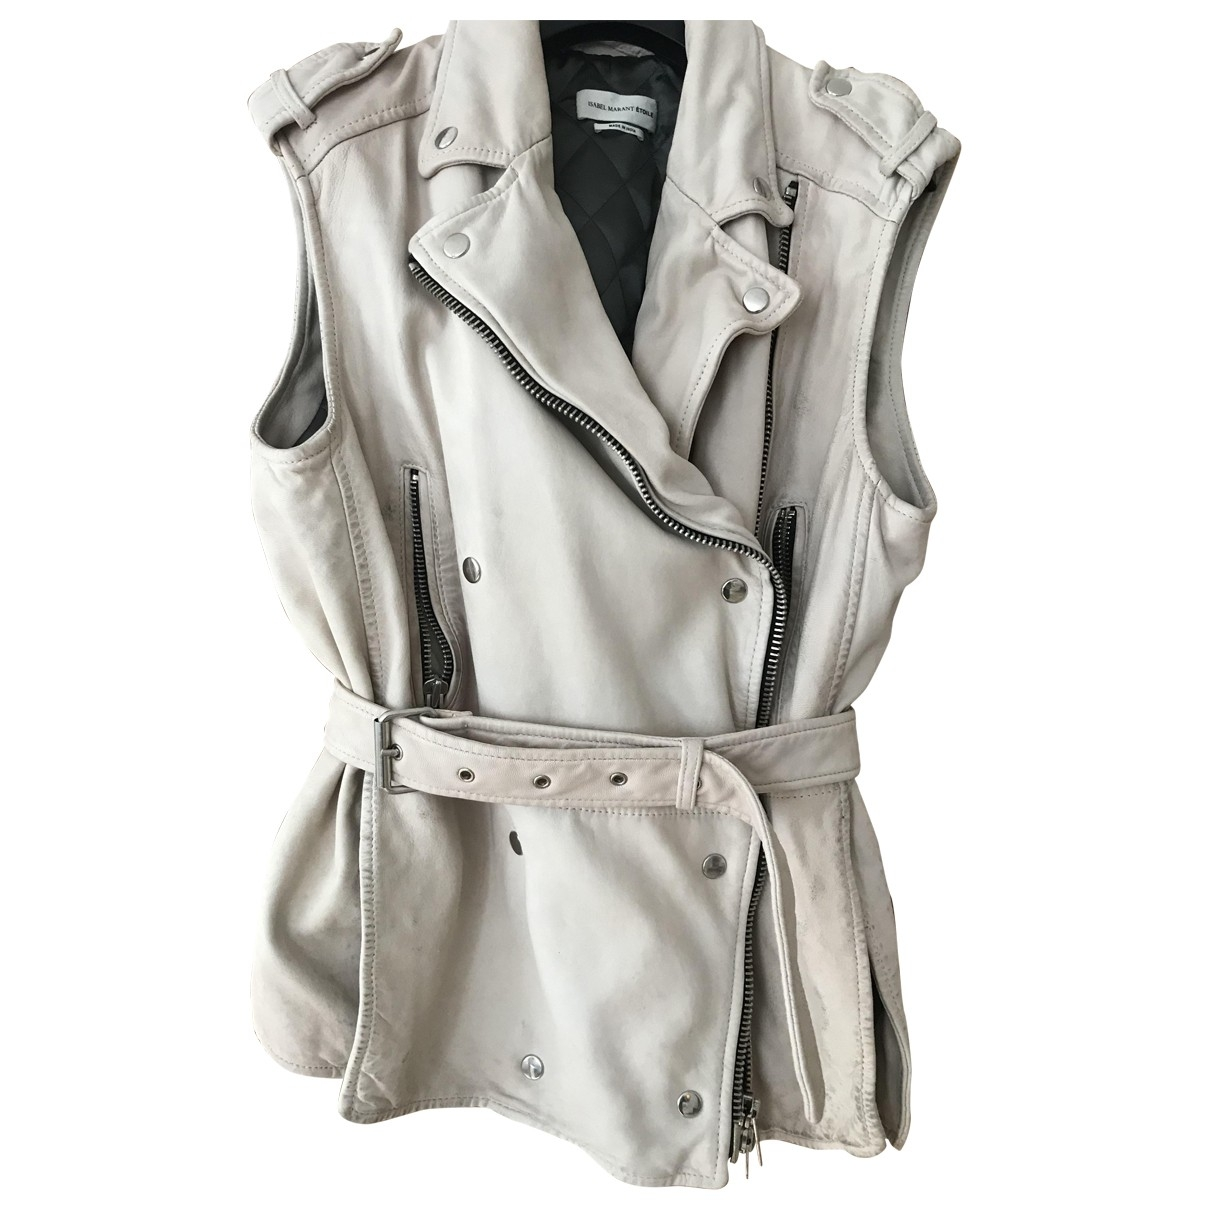 Isabel Marant Etoile \N Beige Leather jacket for Women 40 FR